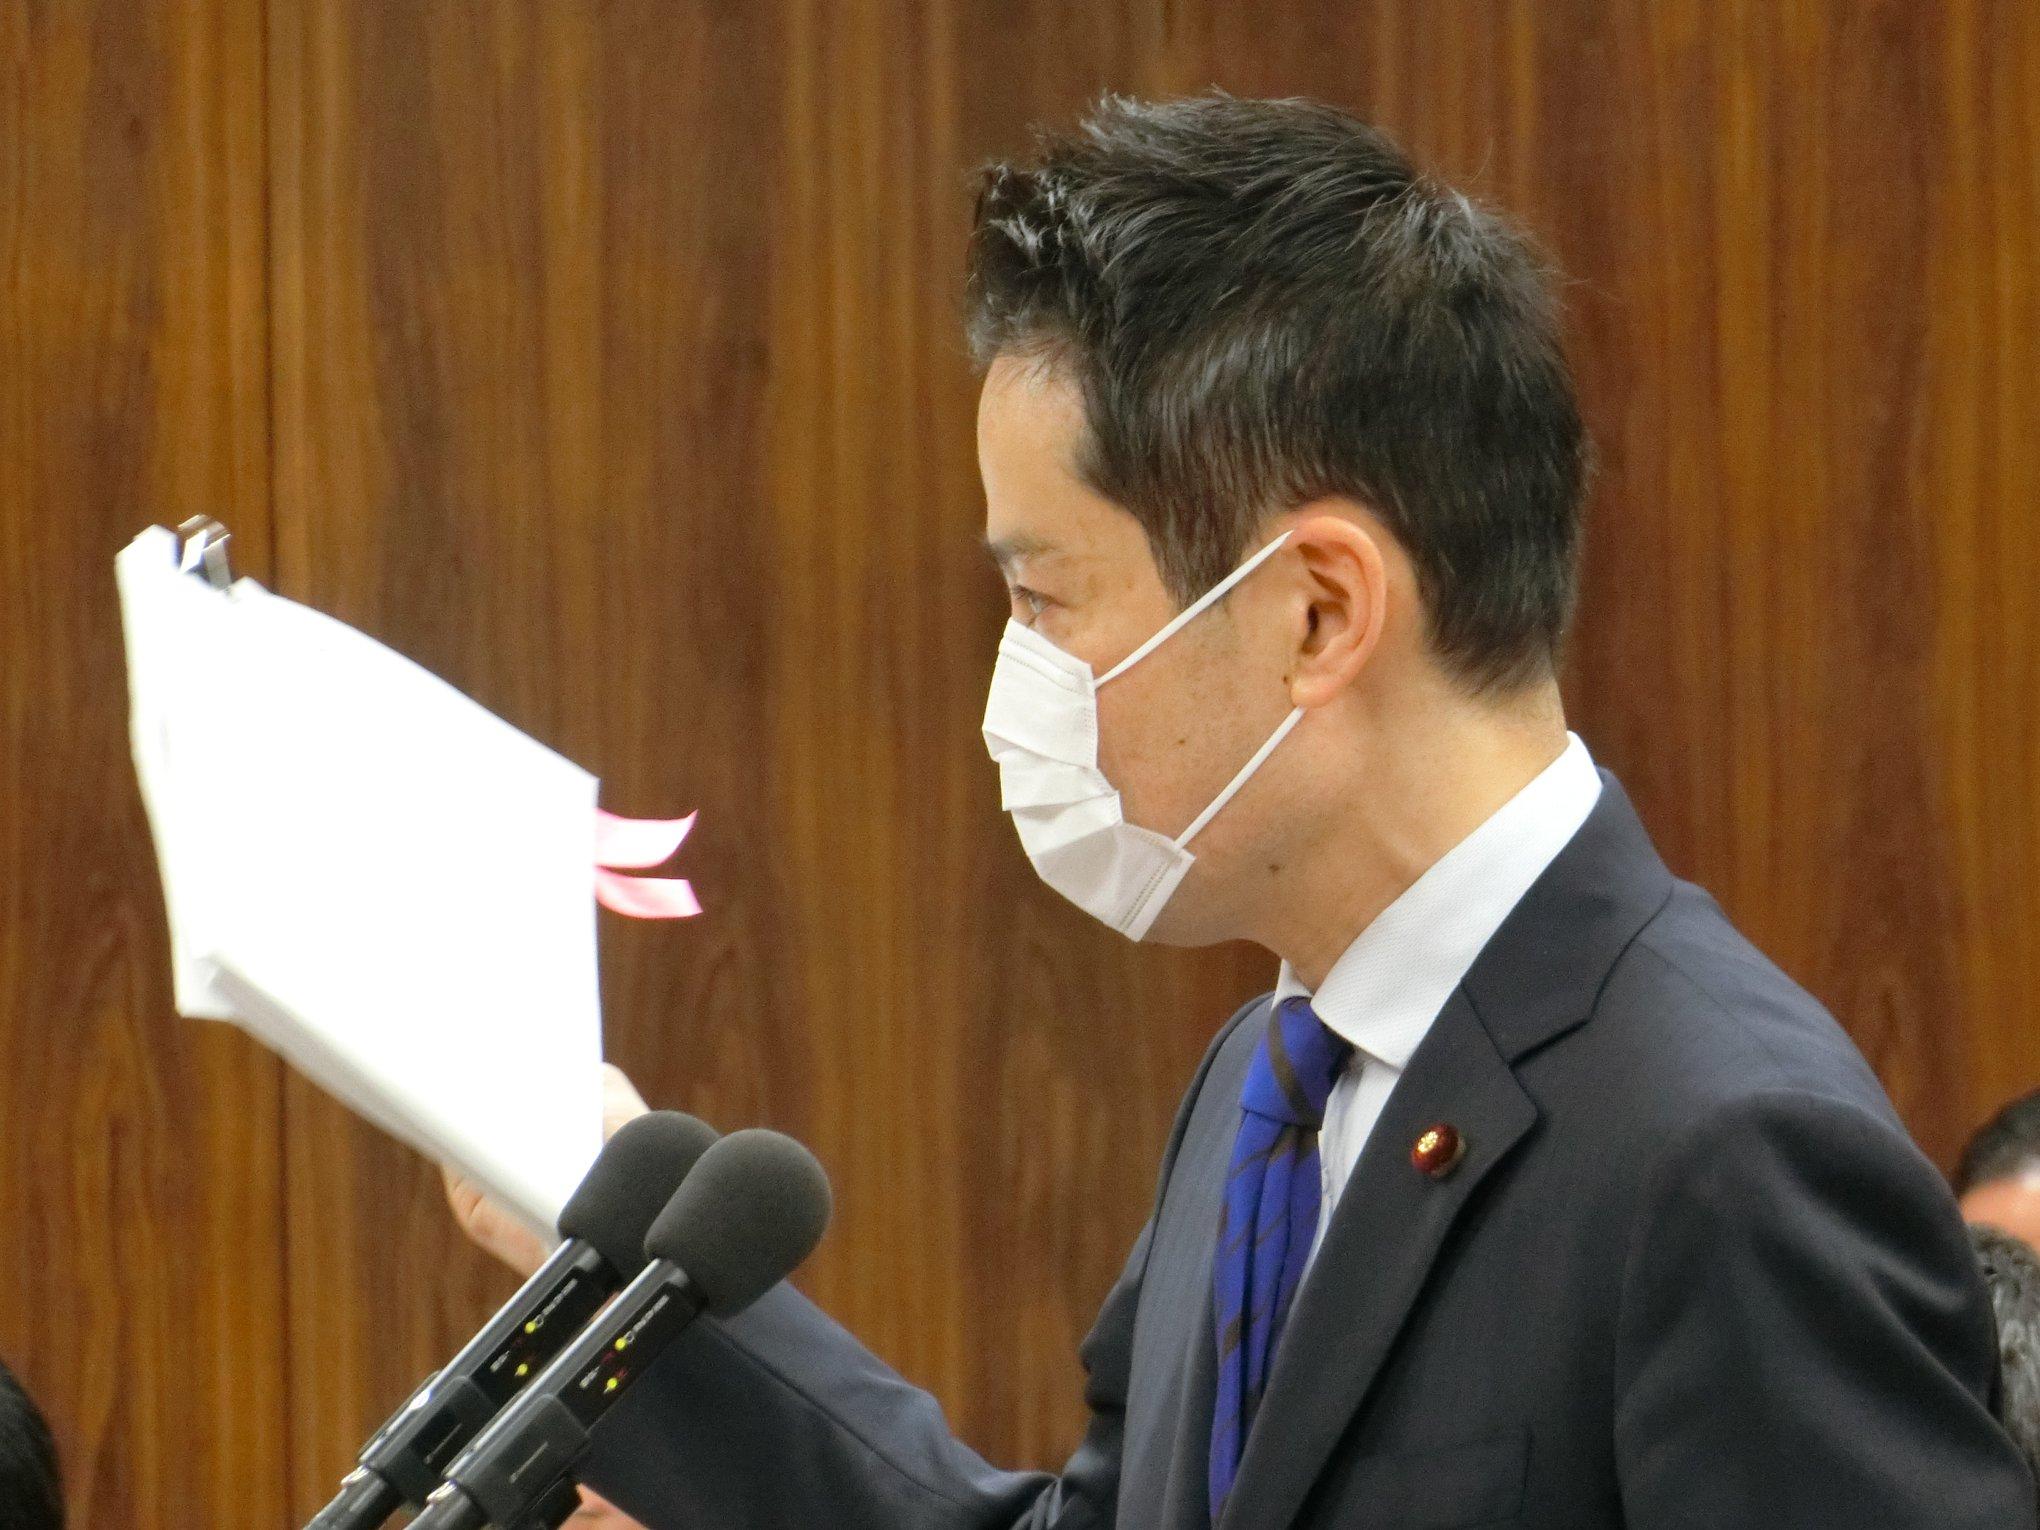 関西電力の森本孝新社長と質疑